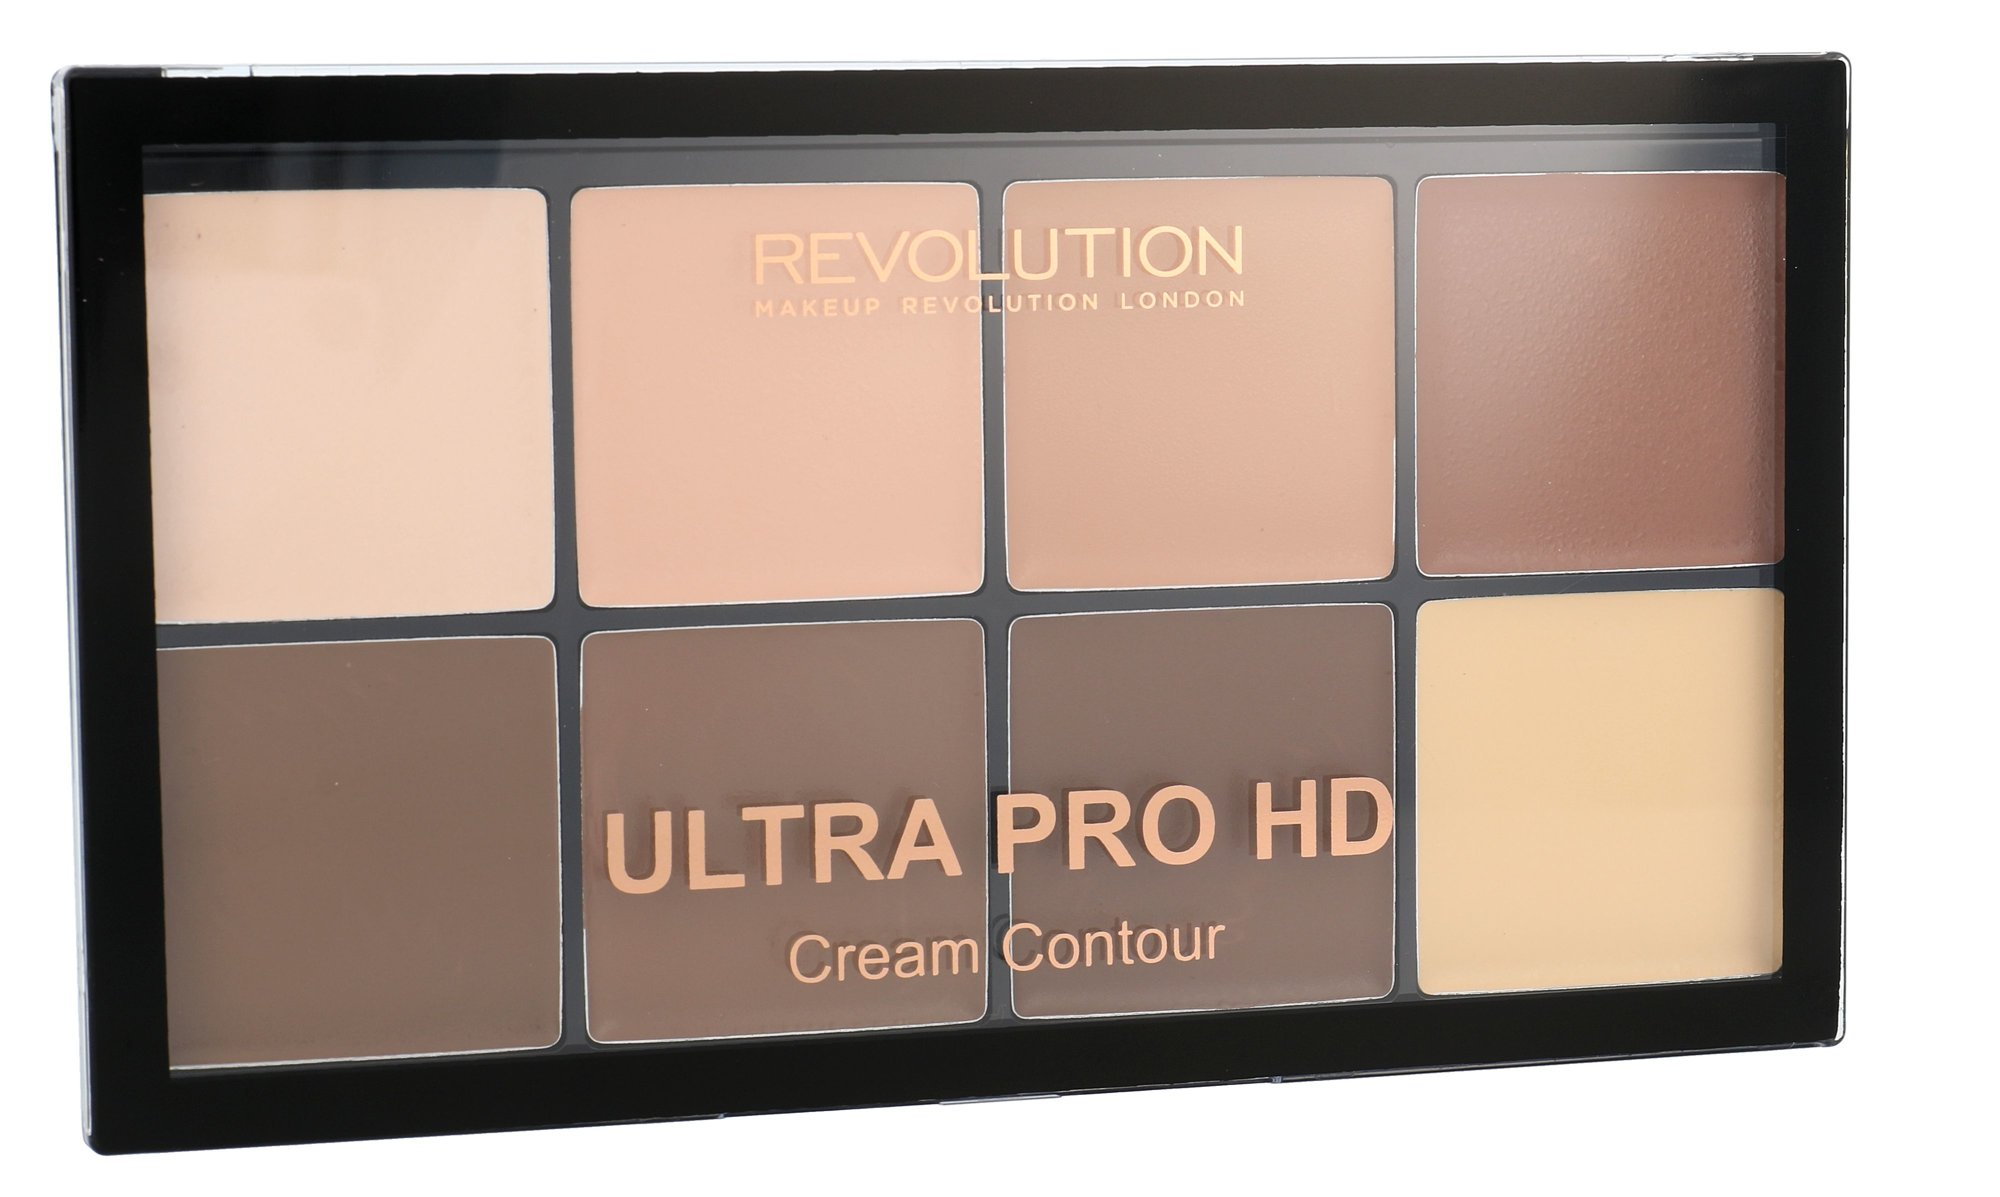 Makeup Revolution London Ultra Pro HD Cosmetic 20ml Light Medium